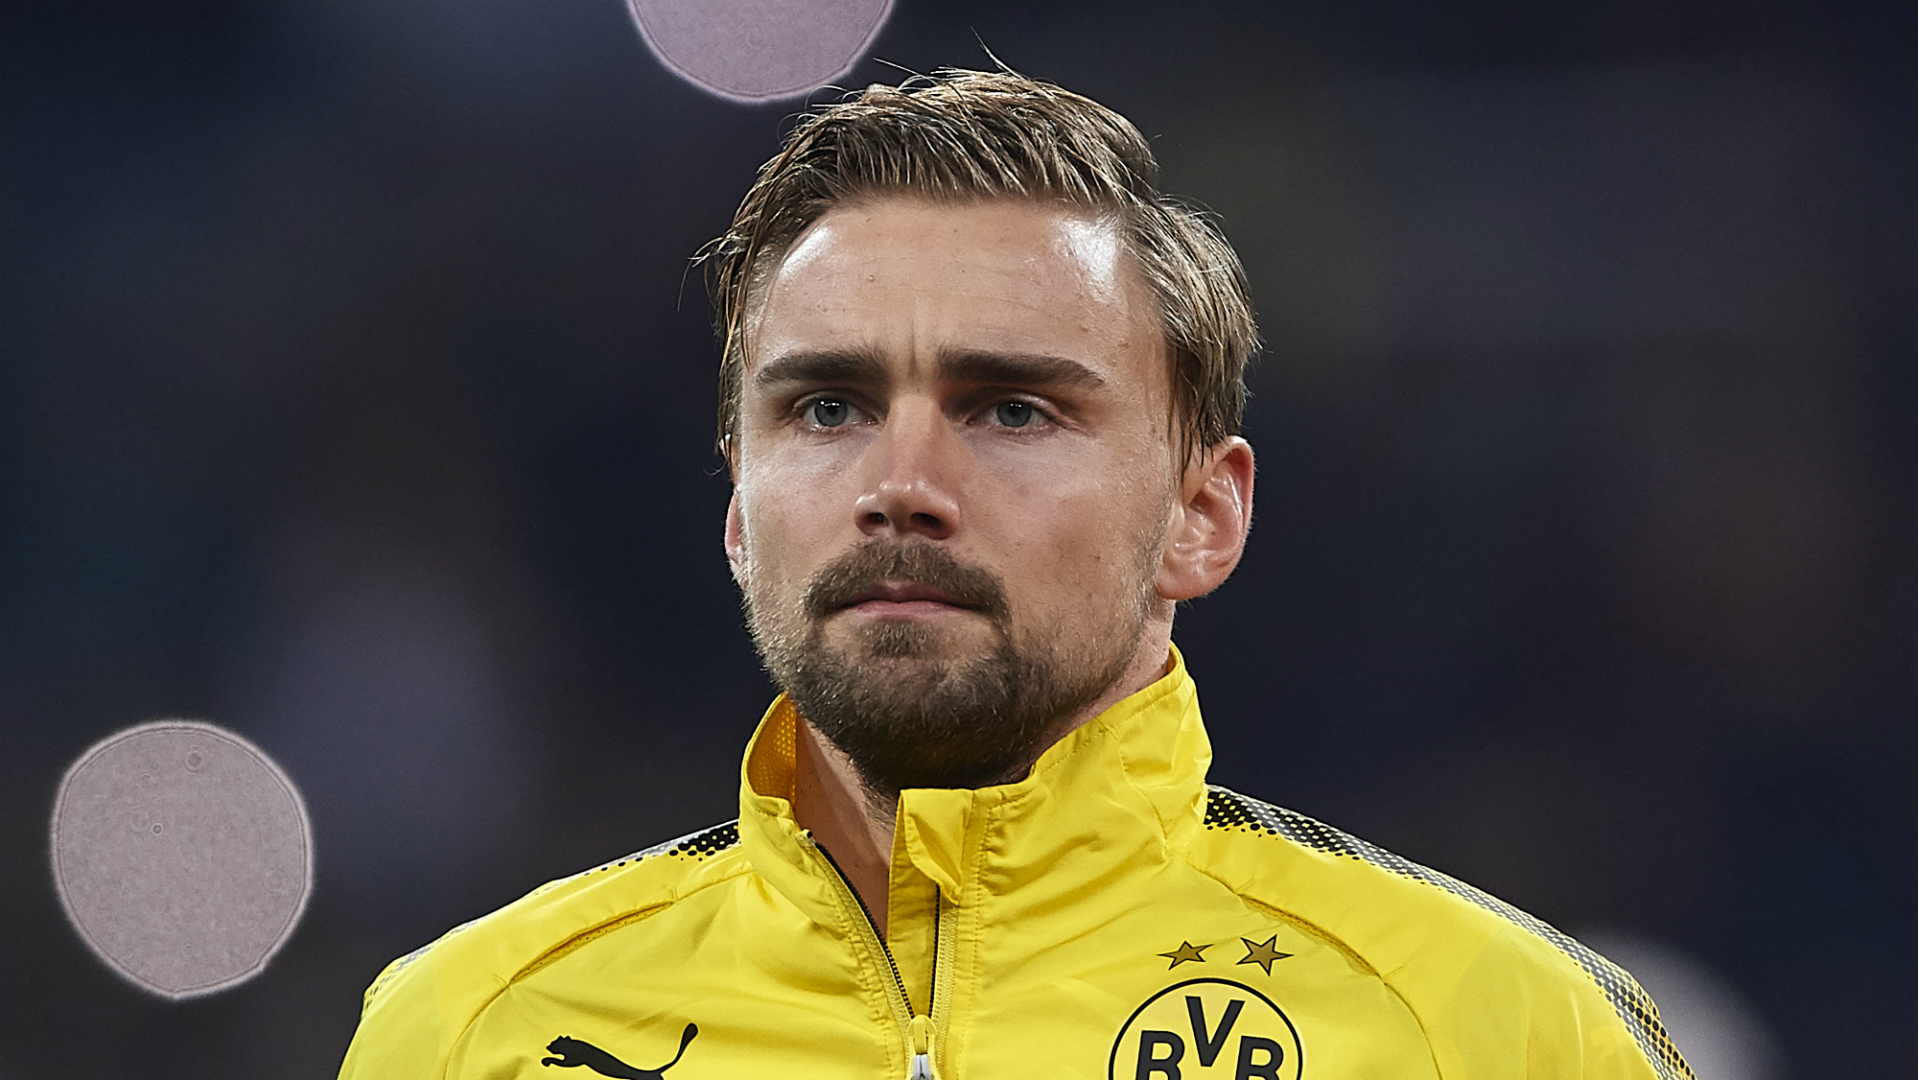 Dortmund captain Schmelzer dropped for poor performances, says Stoger